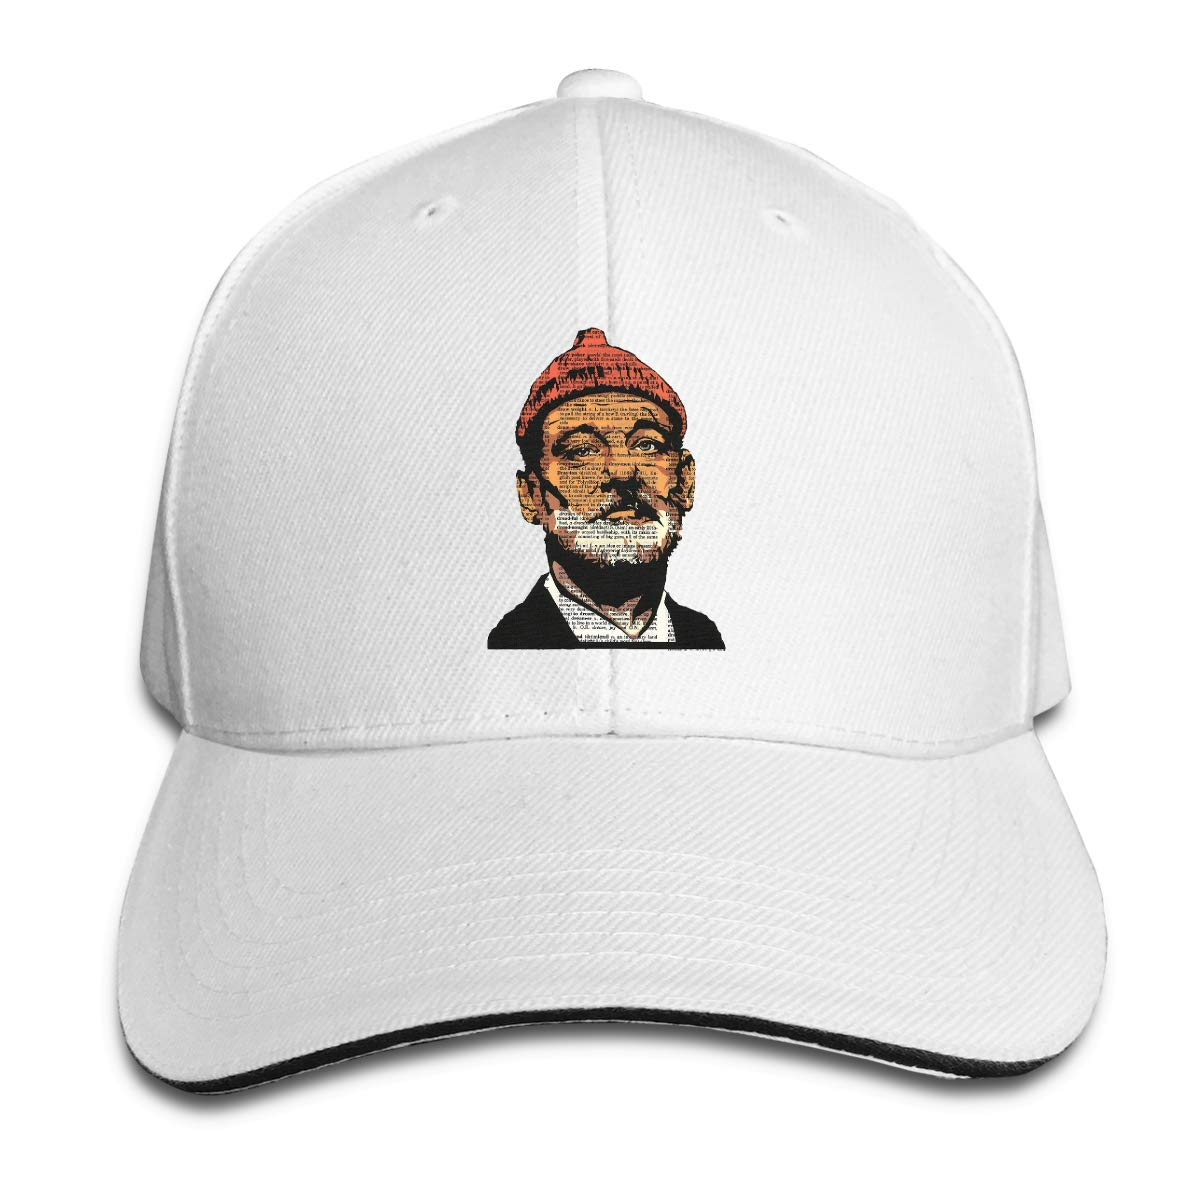 Summer The-Life-Aquatic-with-Steve-Zissou-Bill-Murray Adjustable Sports Hats Sun Hat for Men and Women